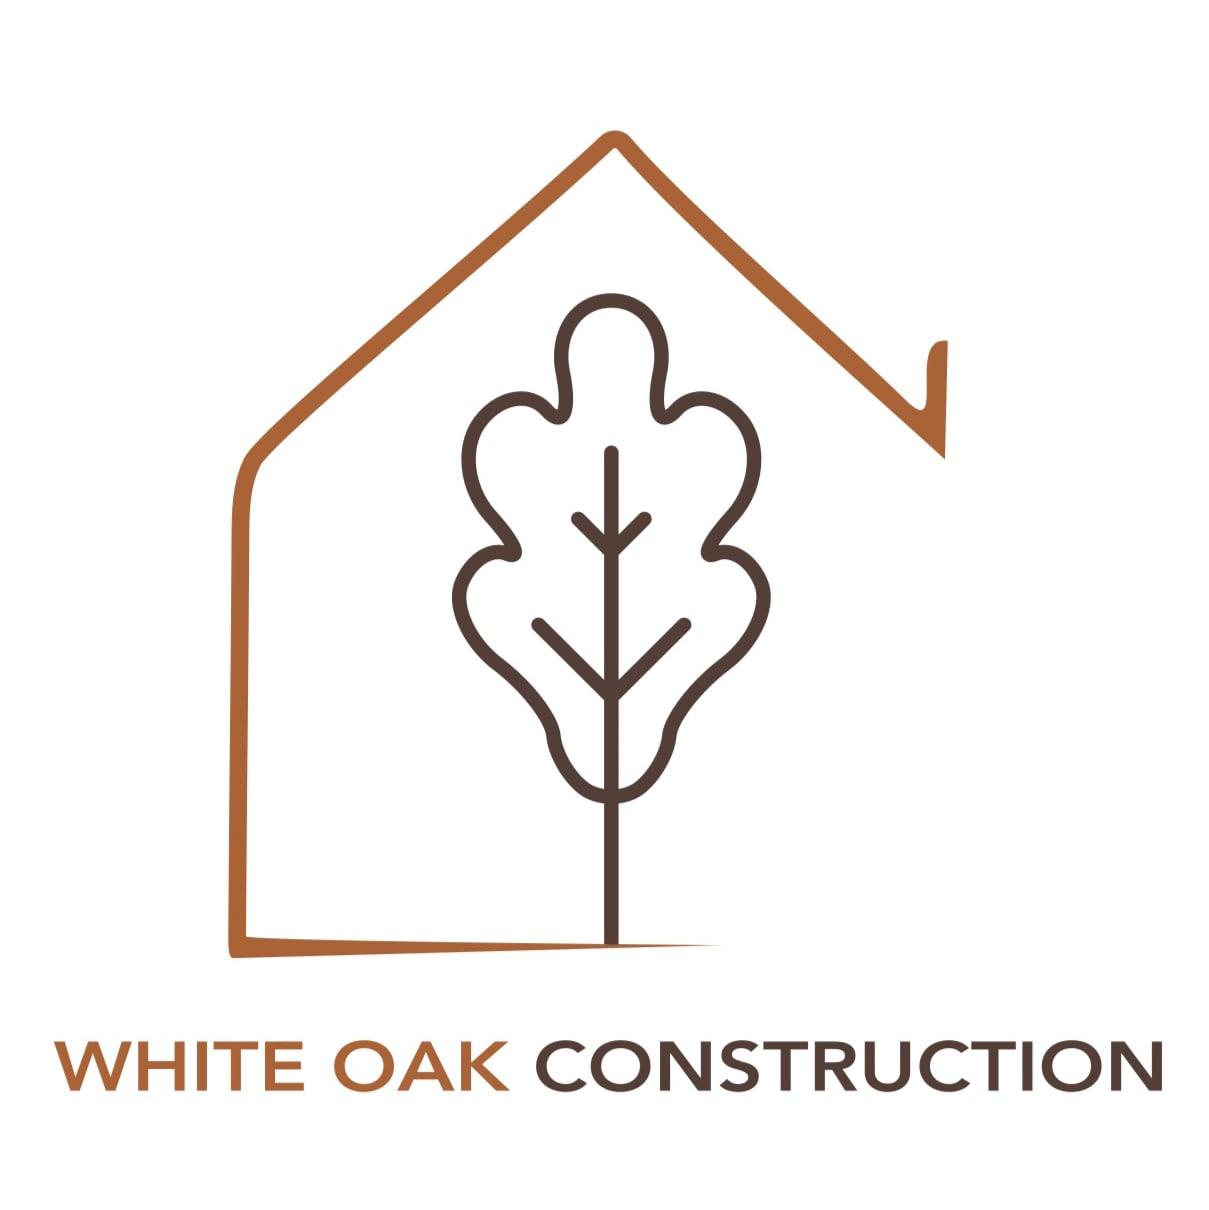 White Oak Construction logo